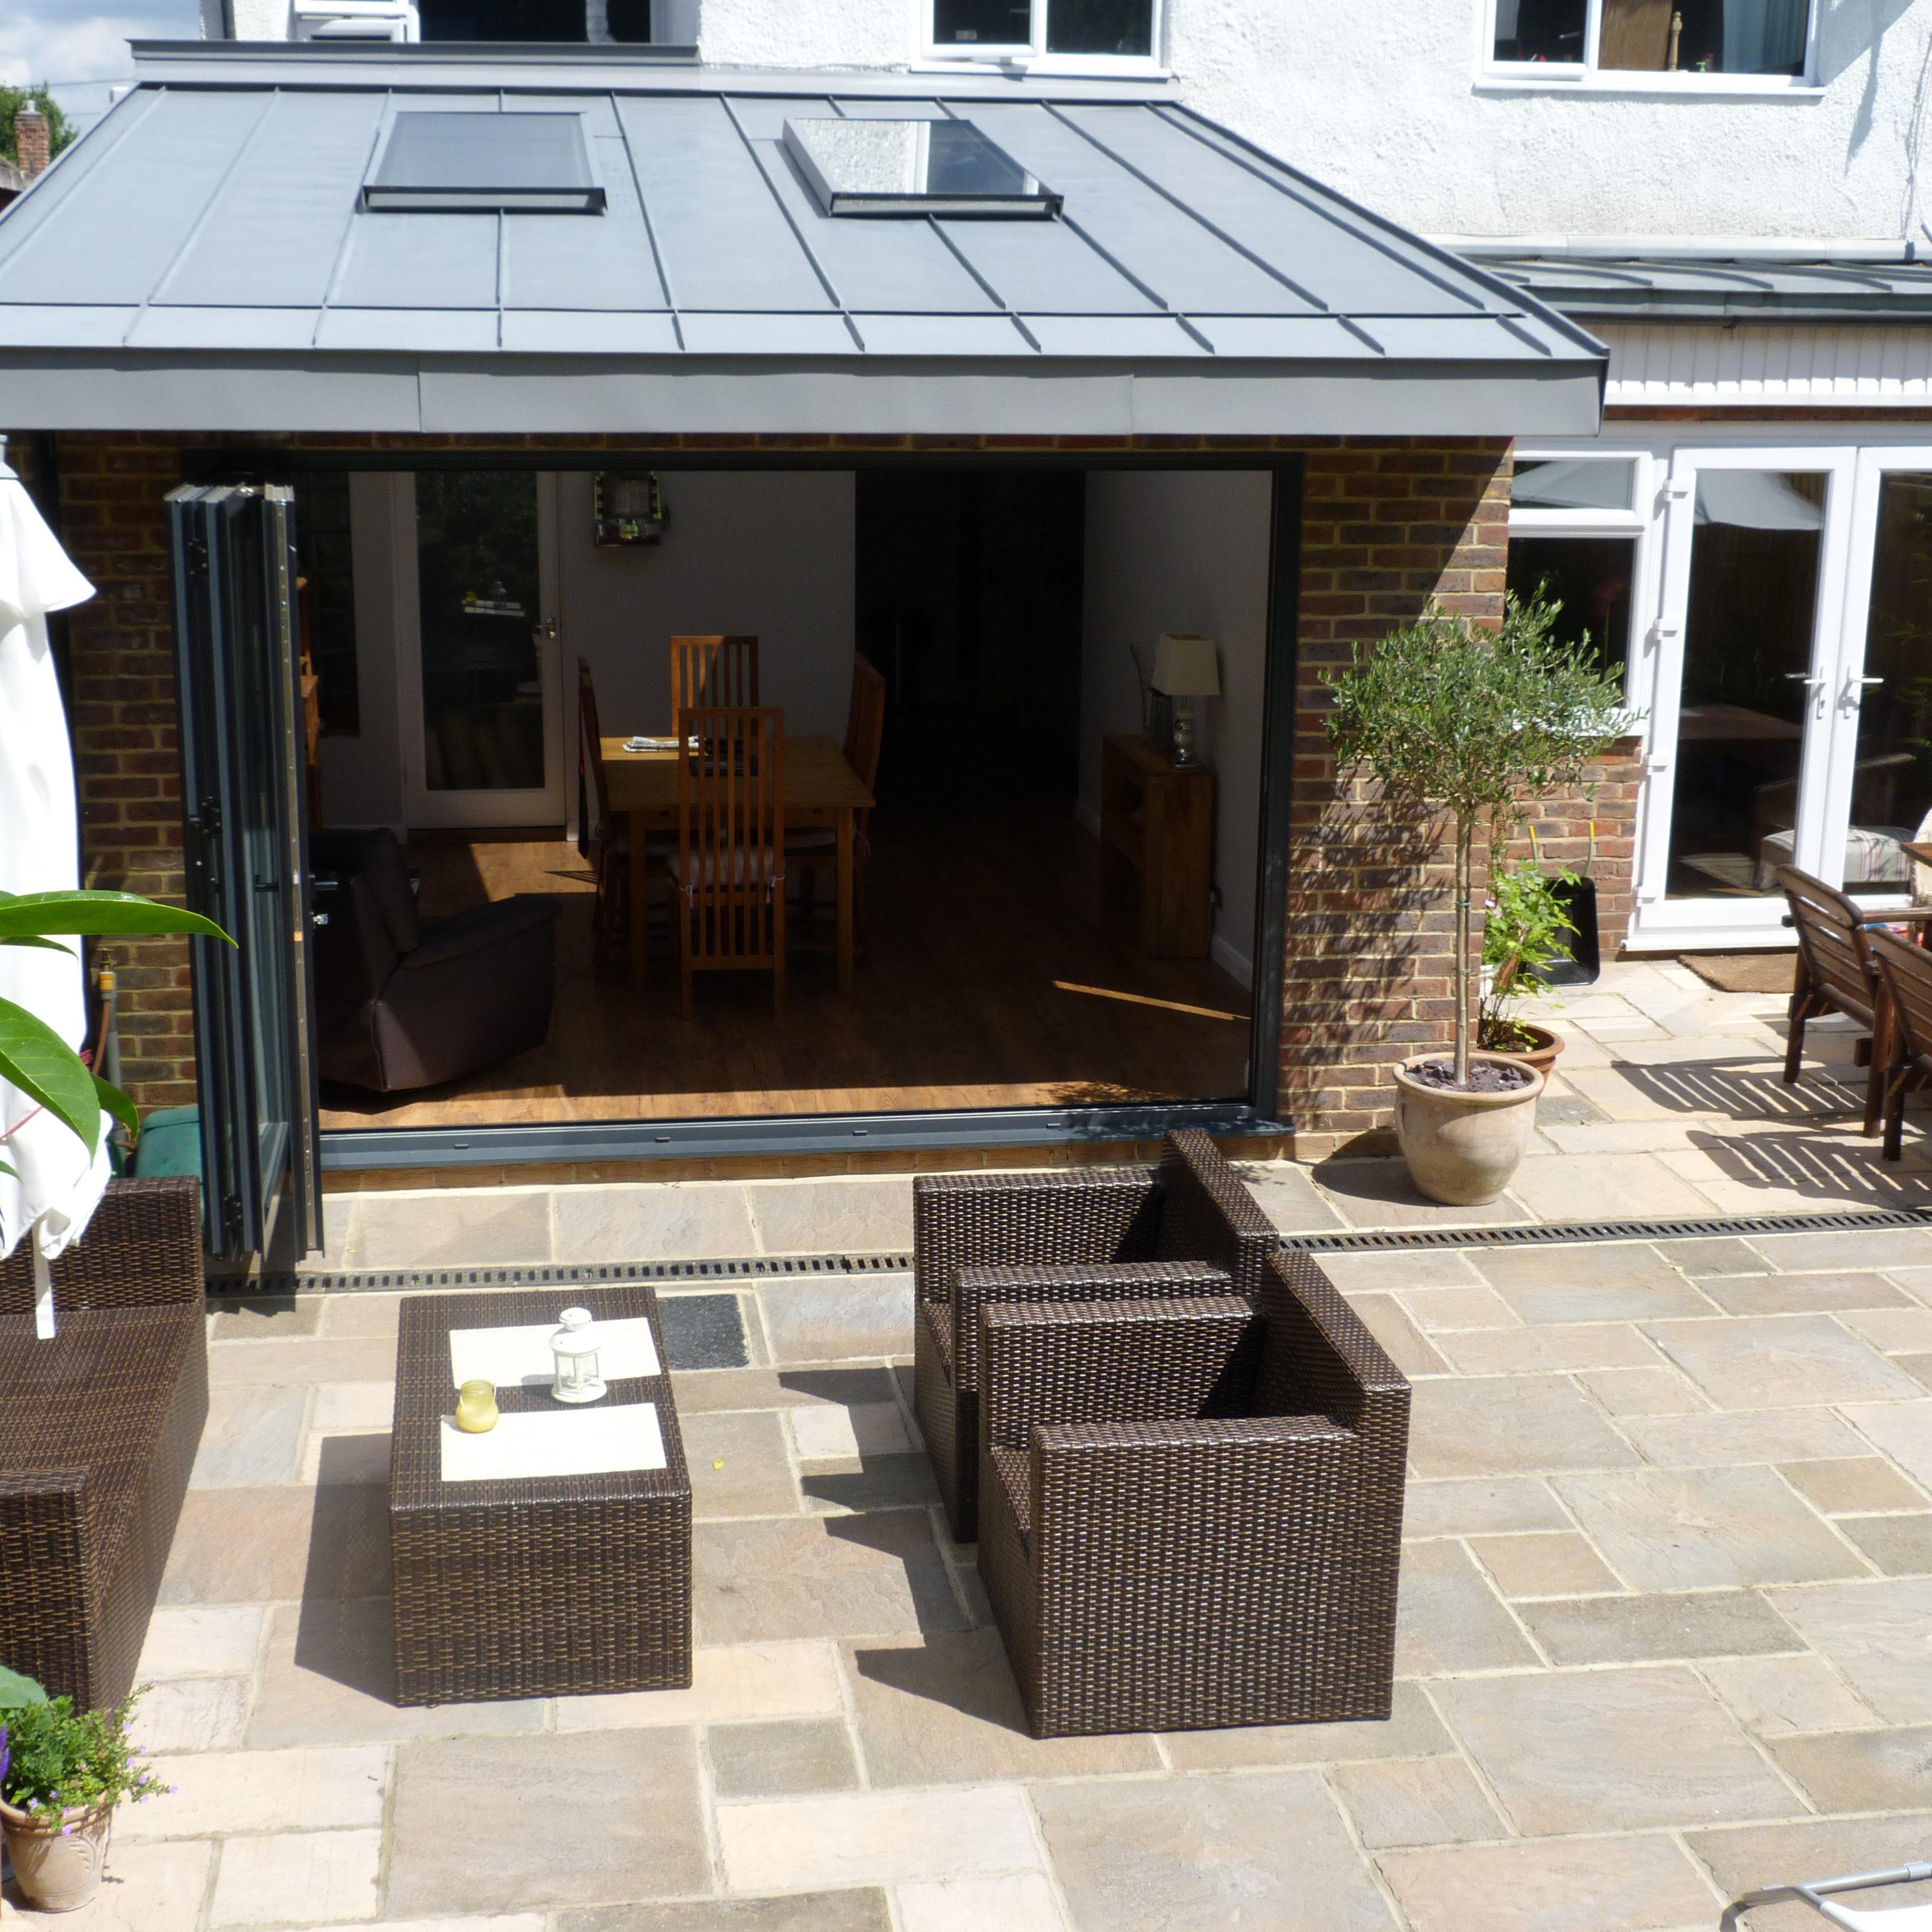 croydon_zinc_roofing_domestic